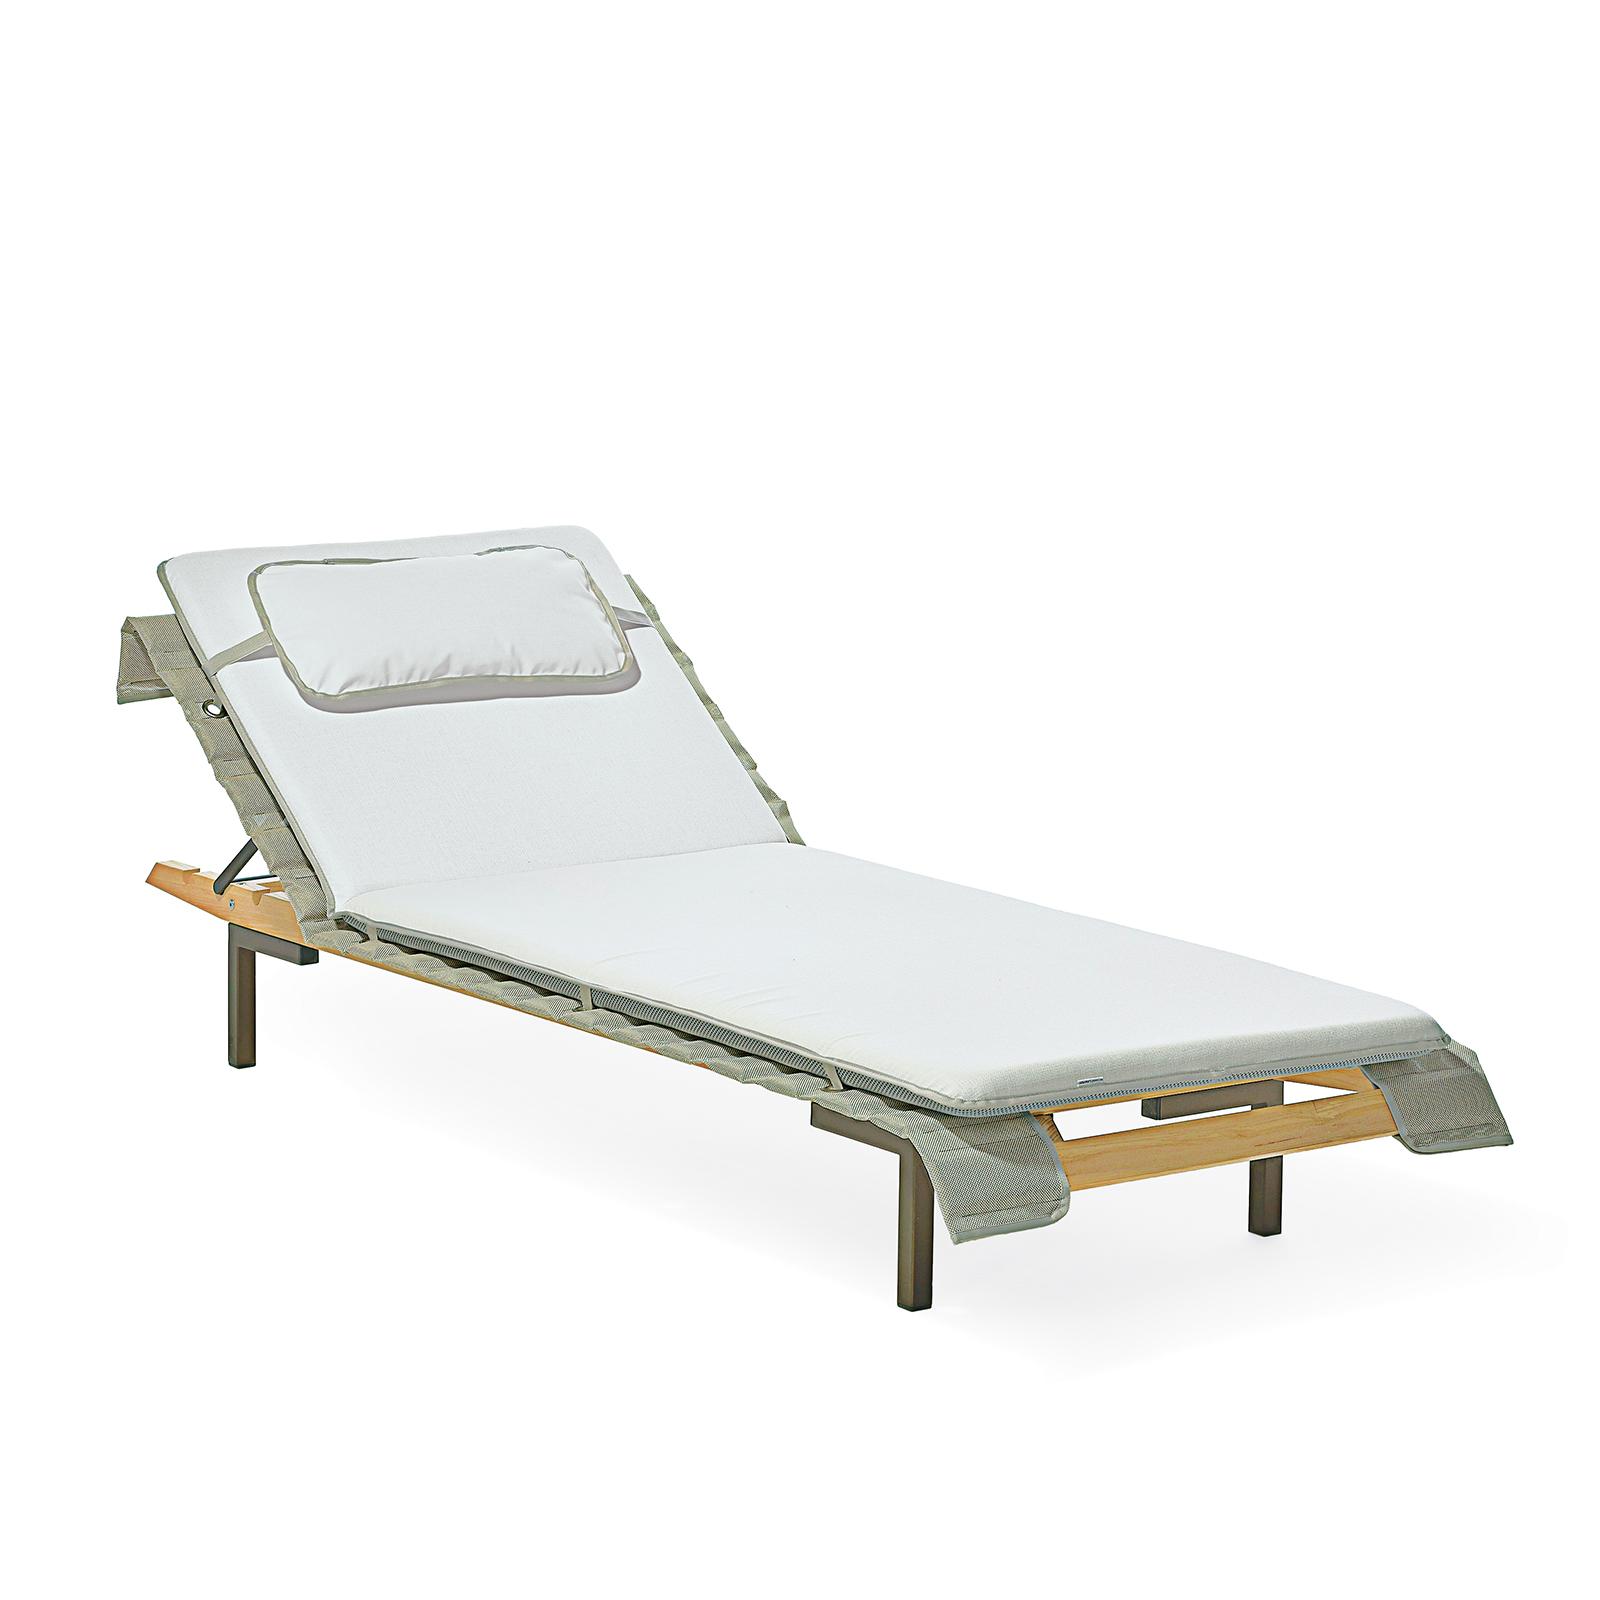 dish's island sun lounger richard lam pert chair